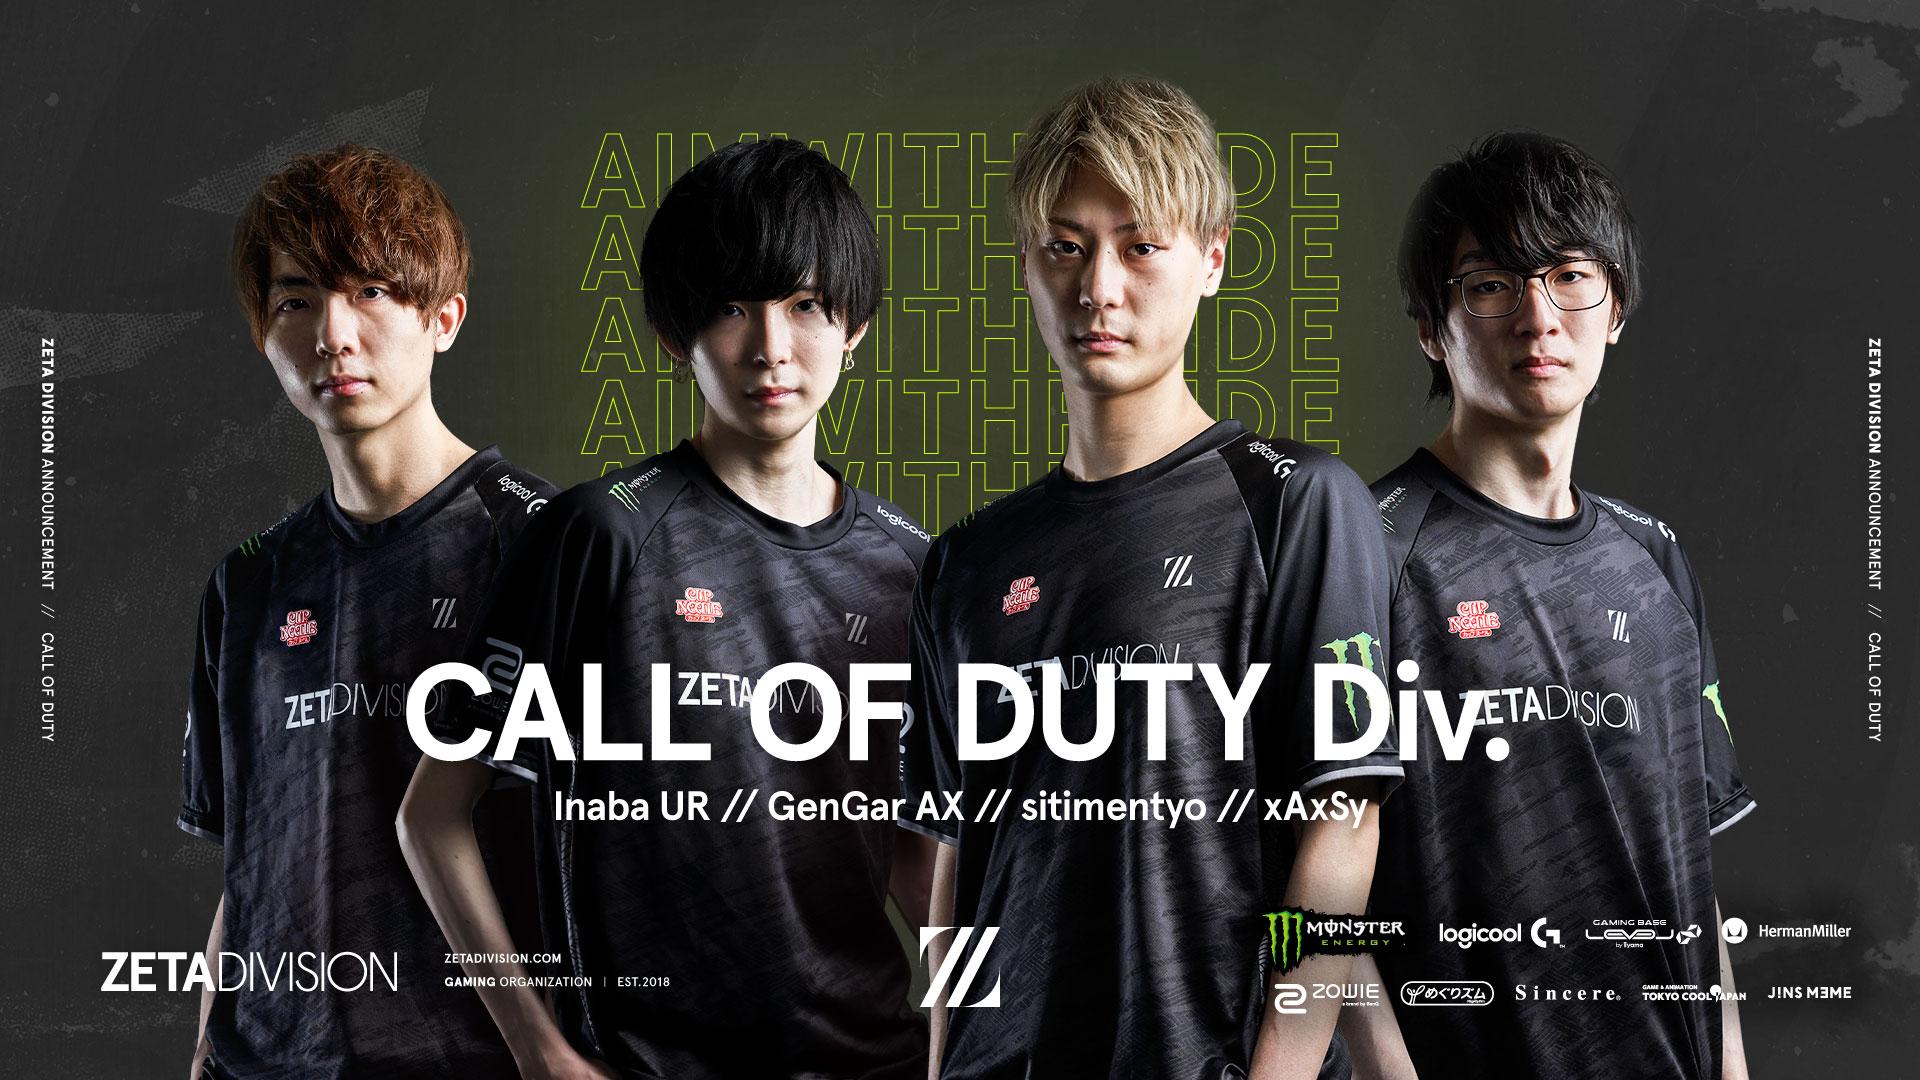 Call of Duty – 部門設立とLibalent Vertex移籍加入のお知らせ